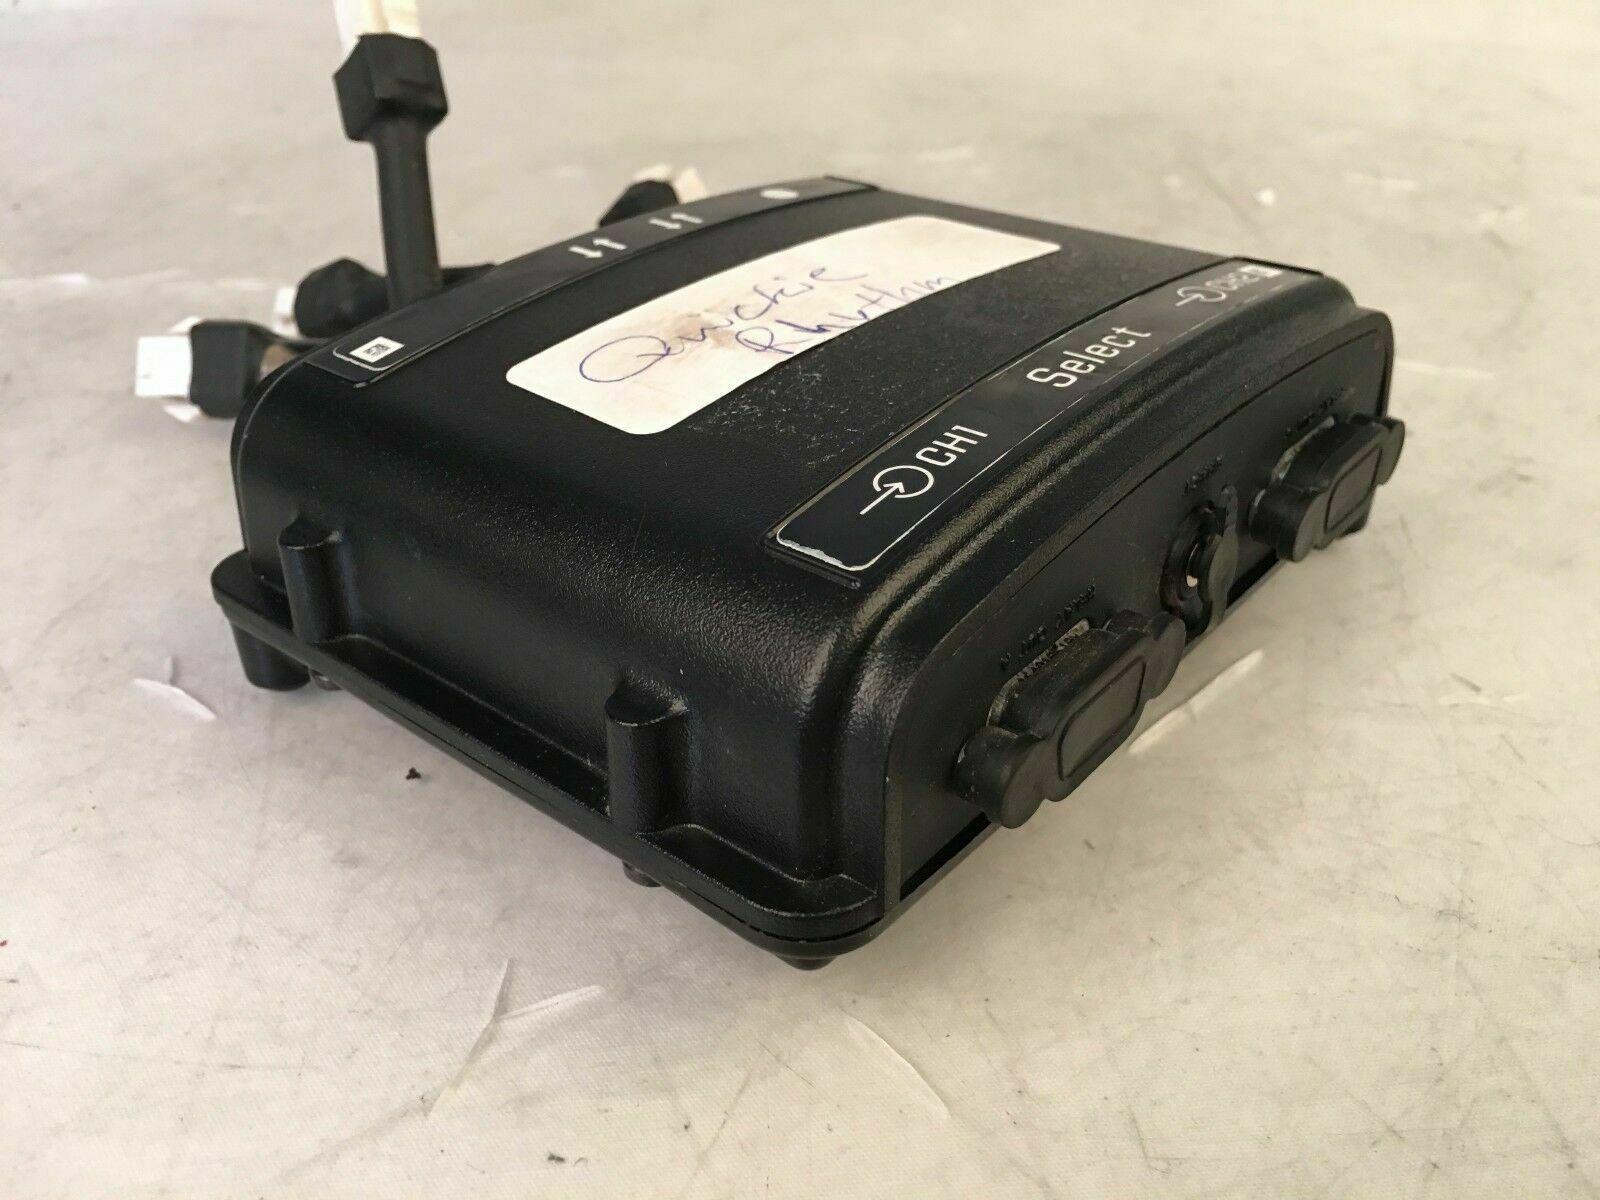 Sunrise Medical - Delphi - QR-ECM Switch Module - for Power Wheelchairs image 2